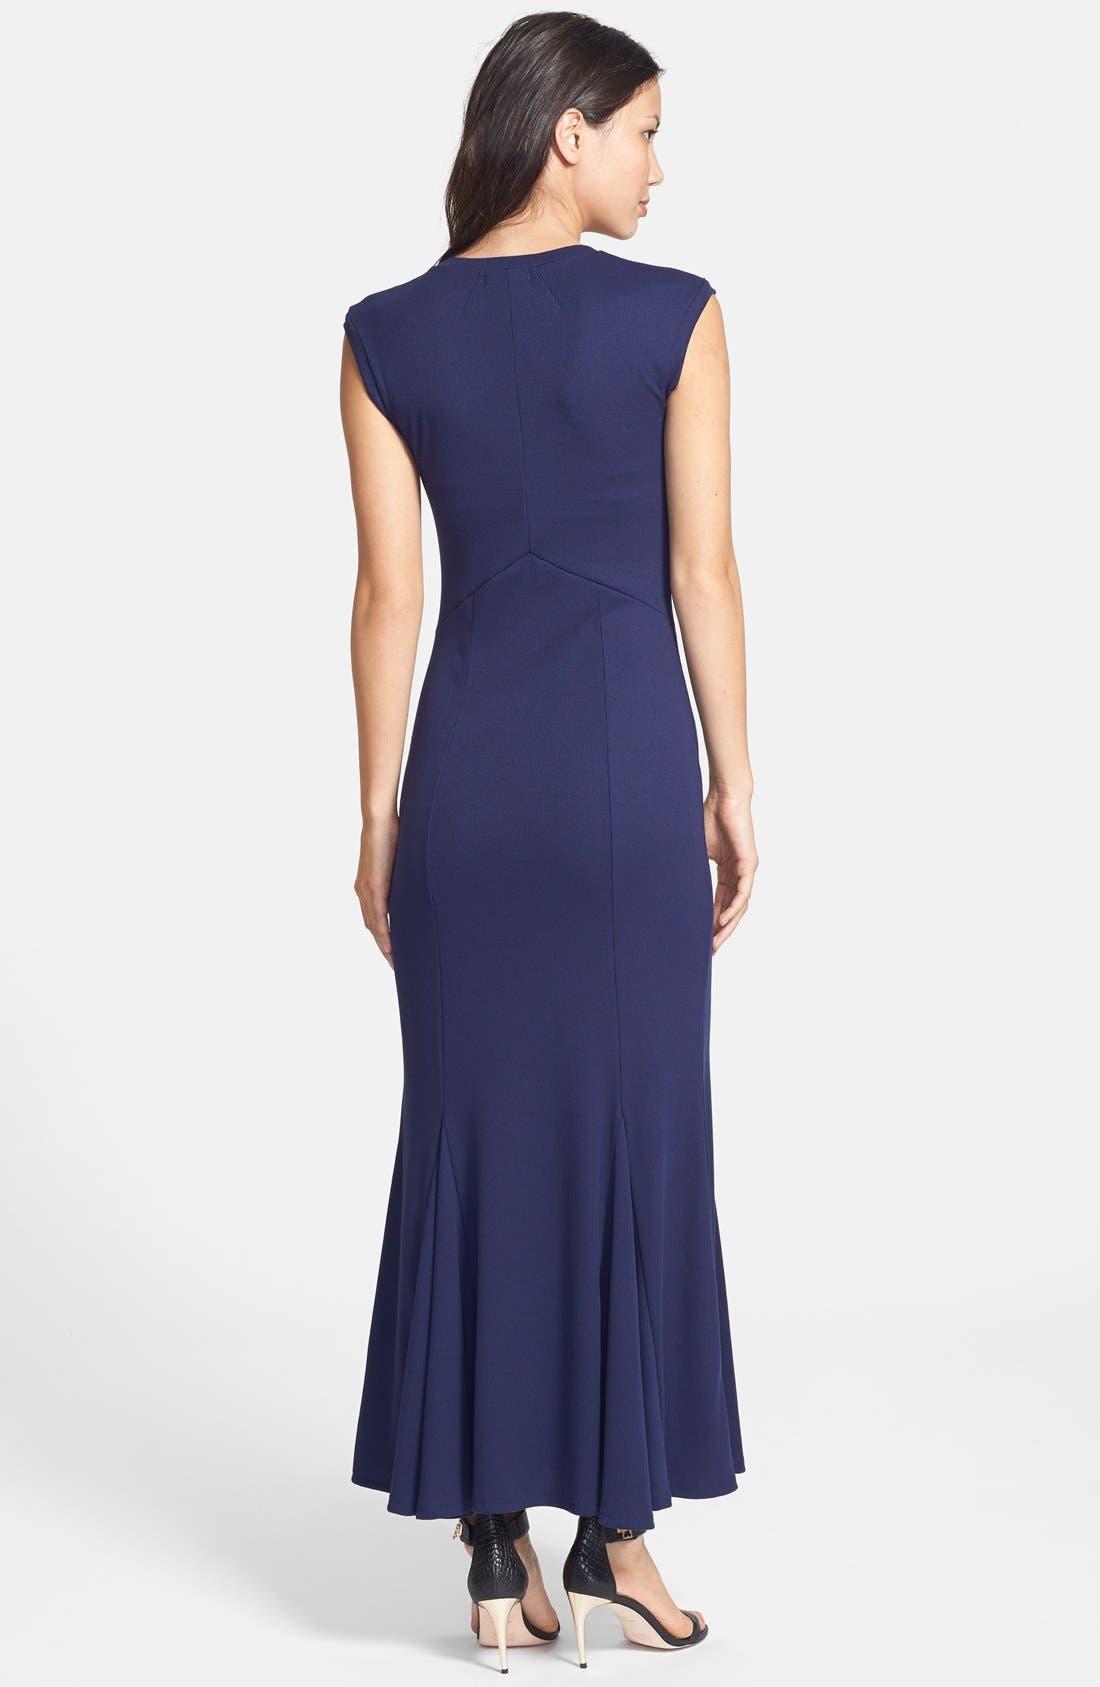 'Amber' Scoop Neck Maxi Dress,                             Alternate thumbnail 3, color,                             410